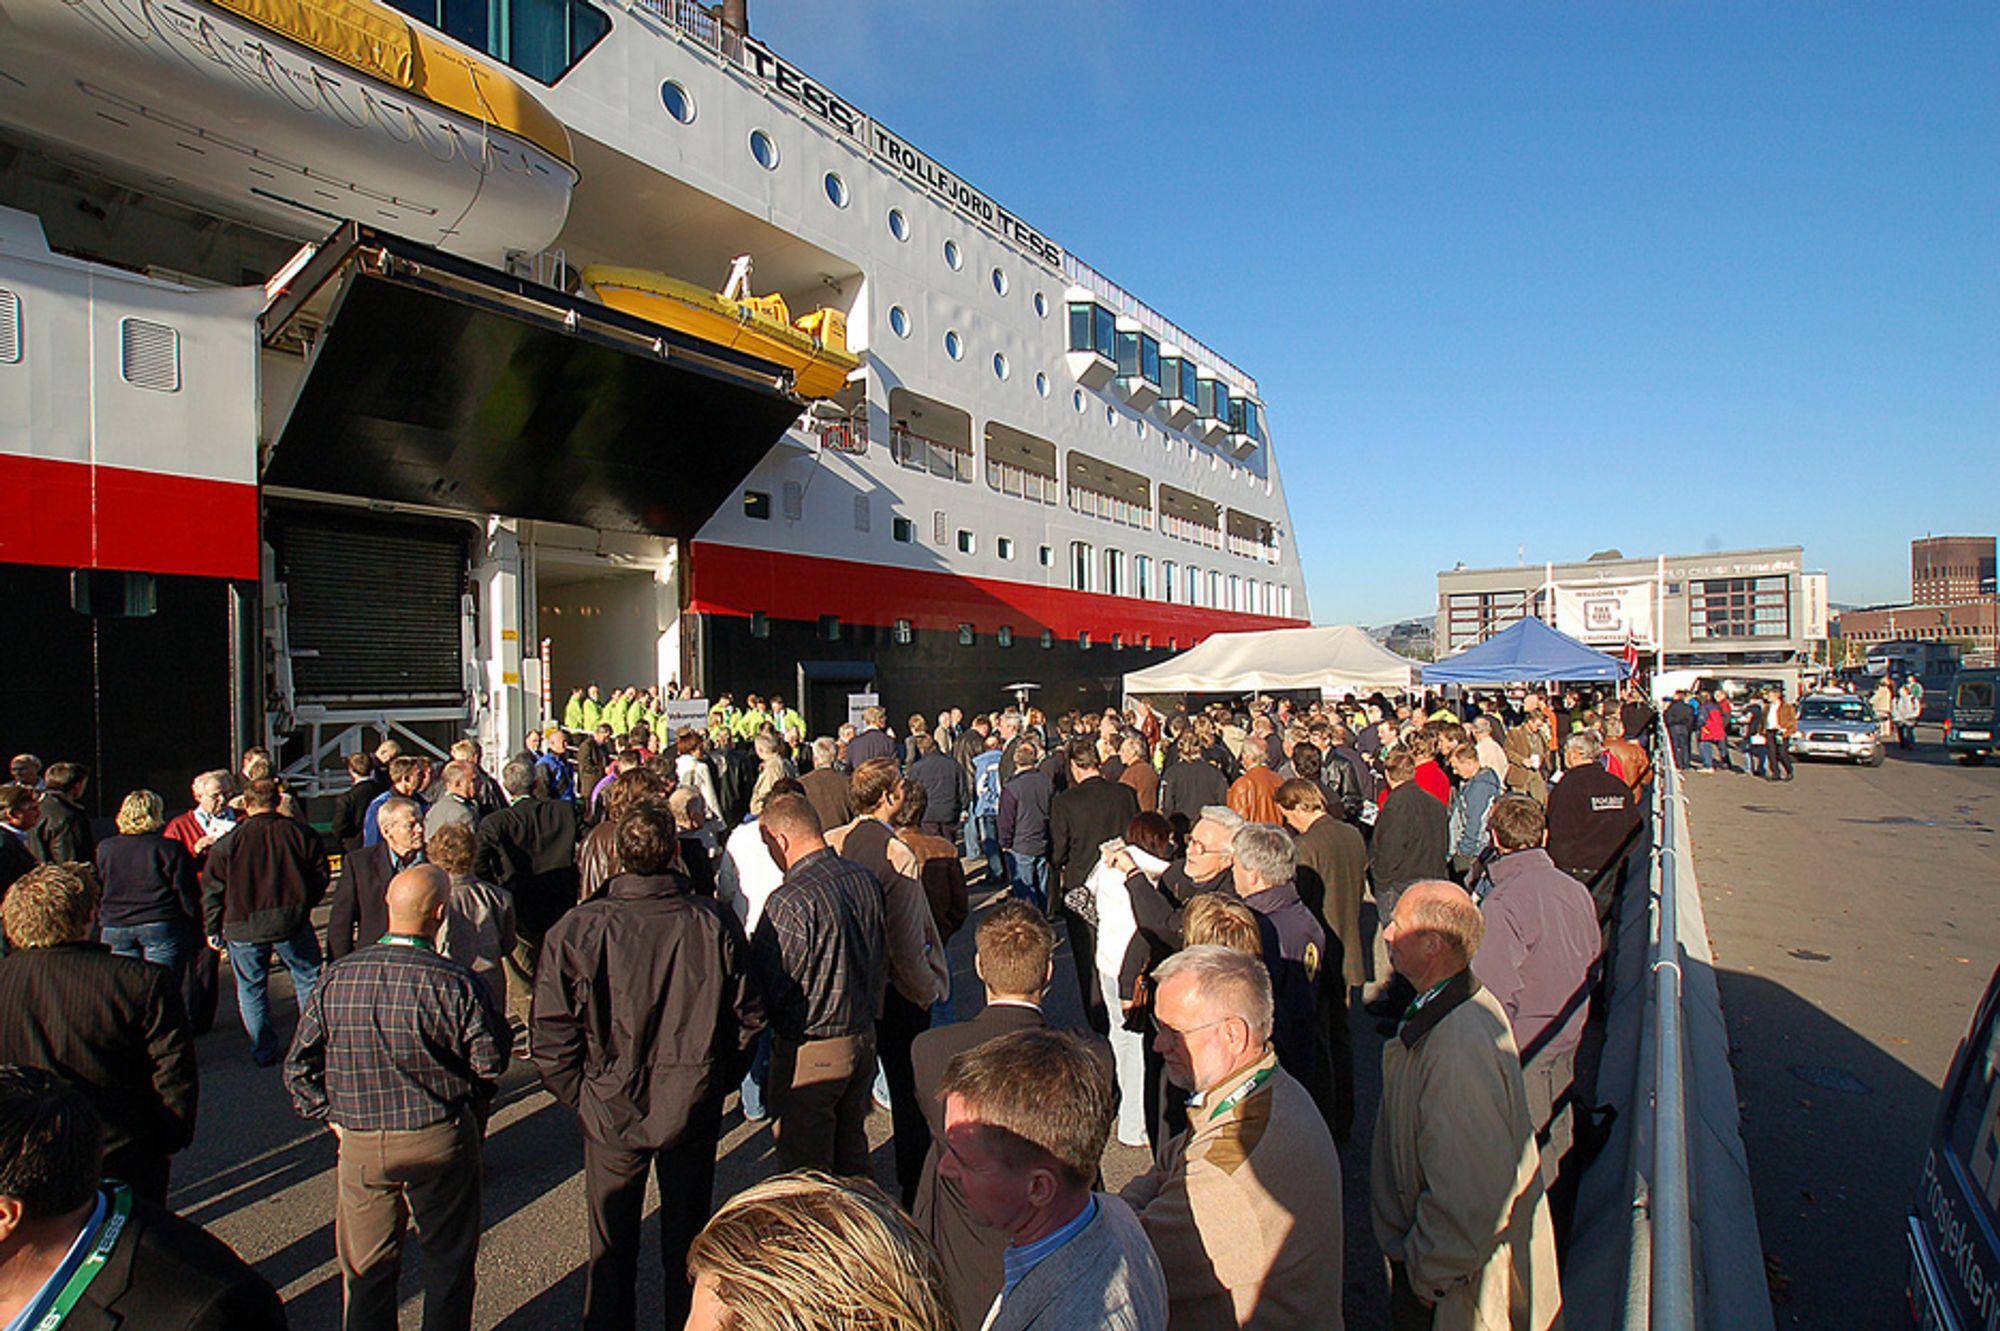 MESSE TIL SJØS: 4500 besøkende deltok sist på Industriens Motemesse. I år håper arrangøren på over 5000.